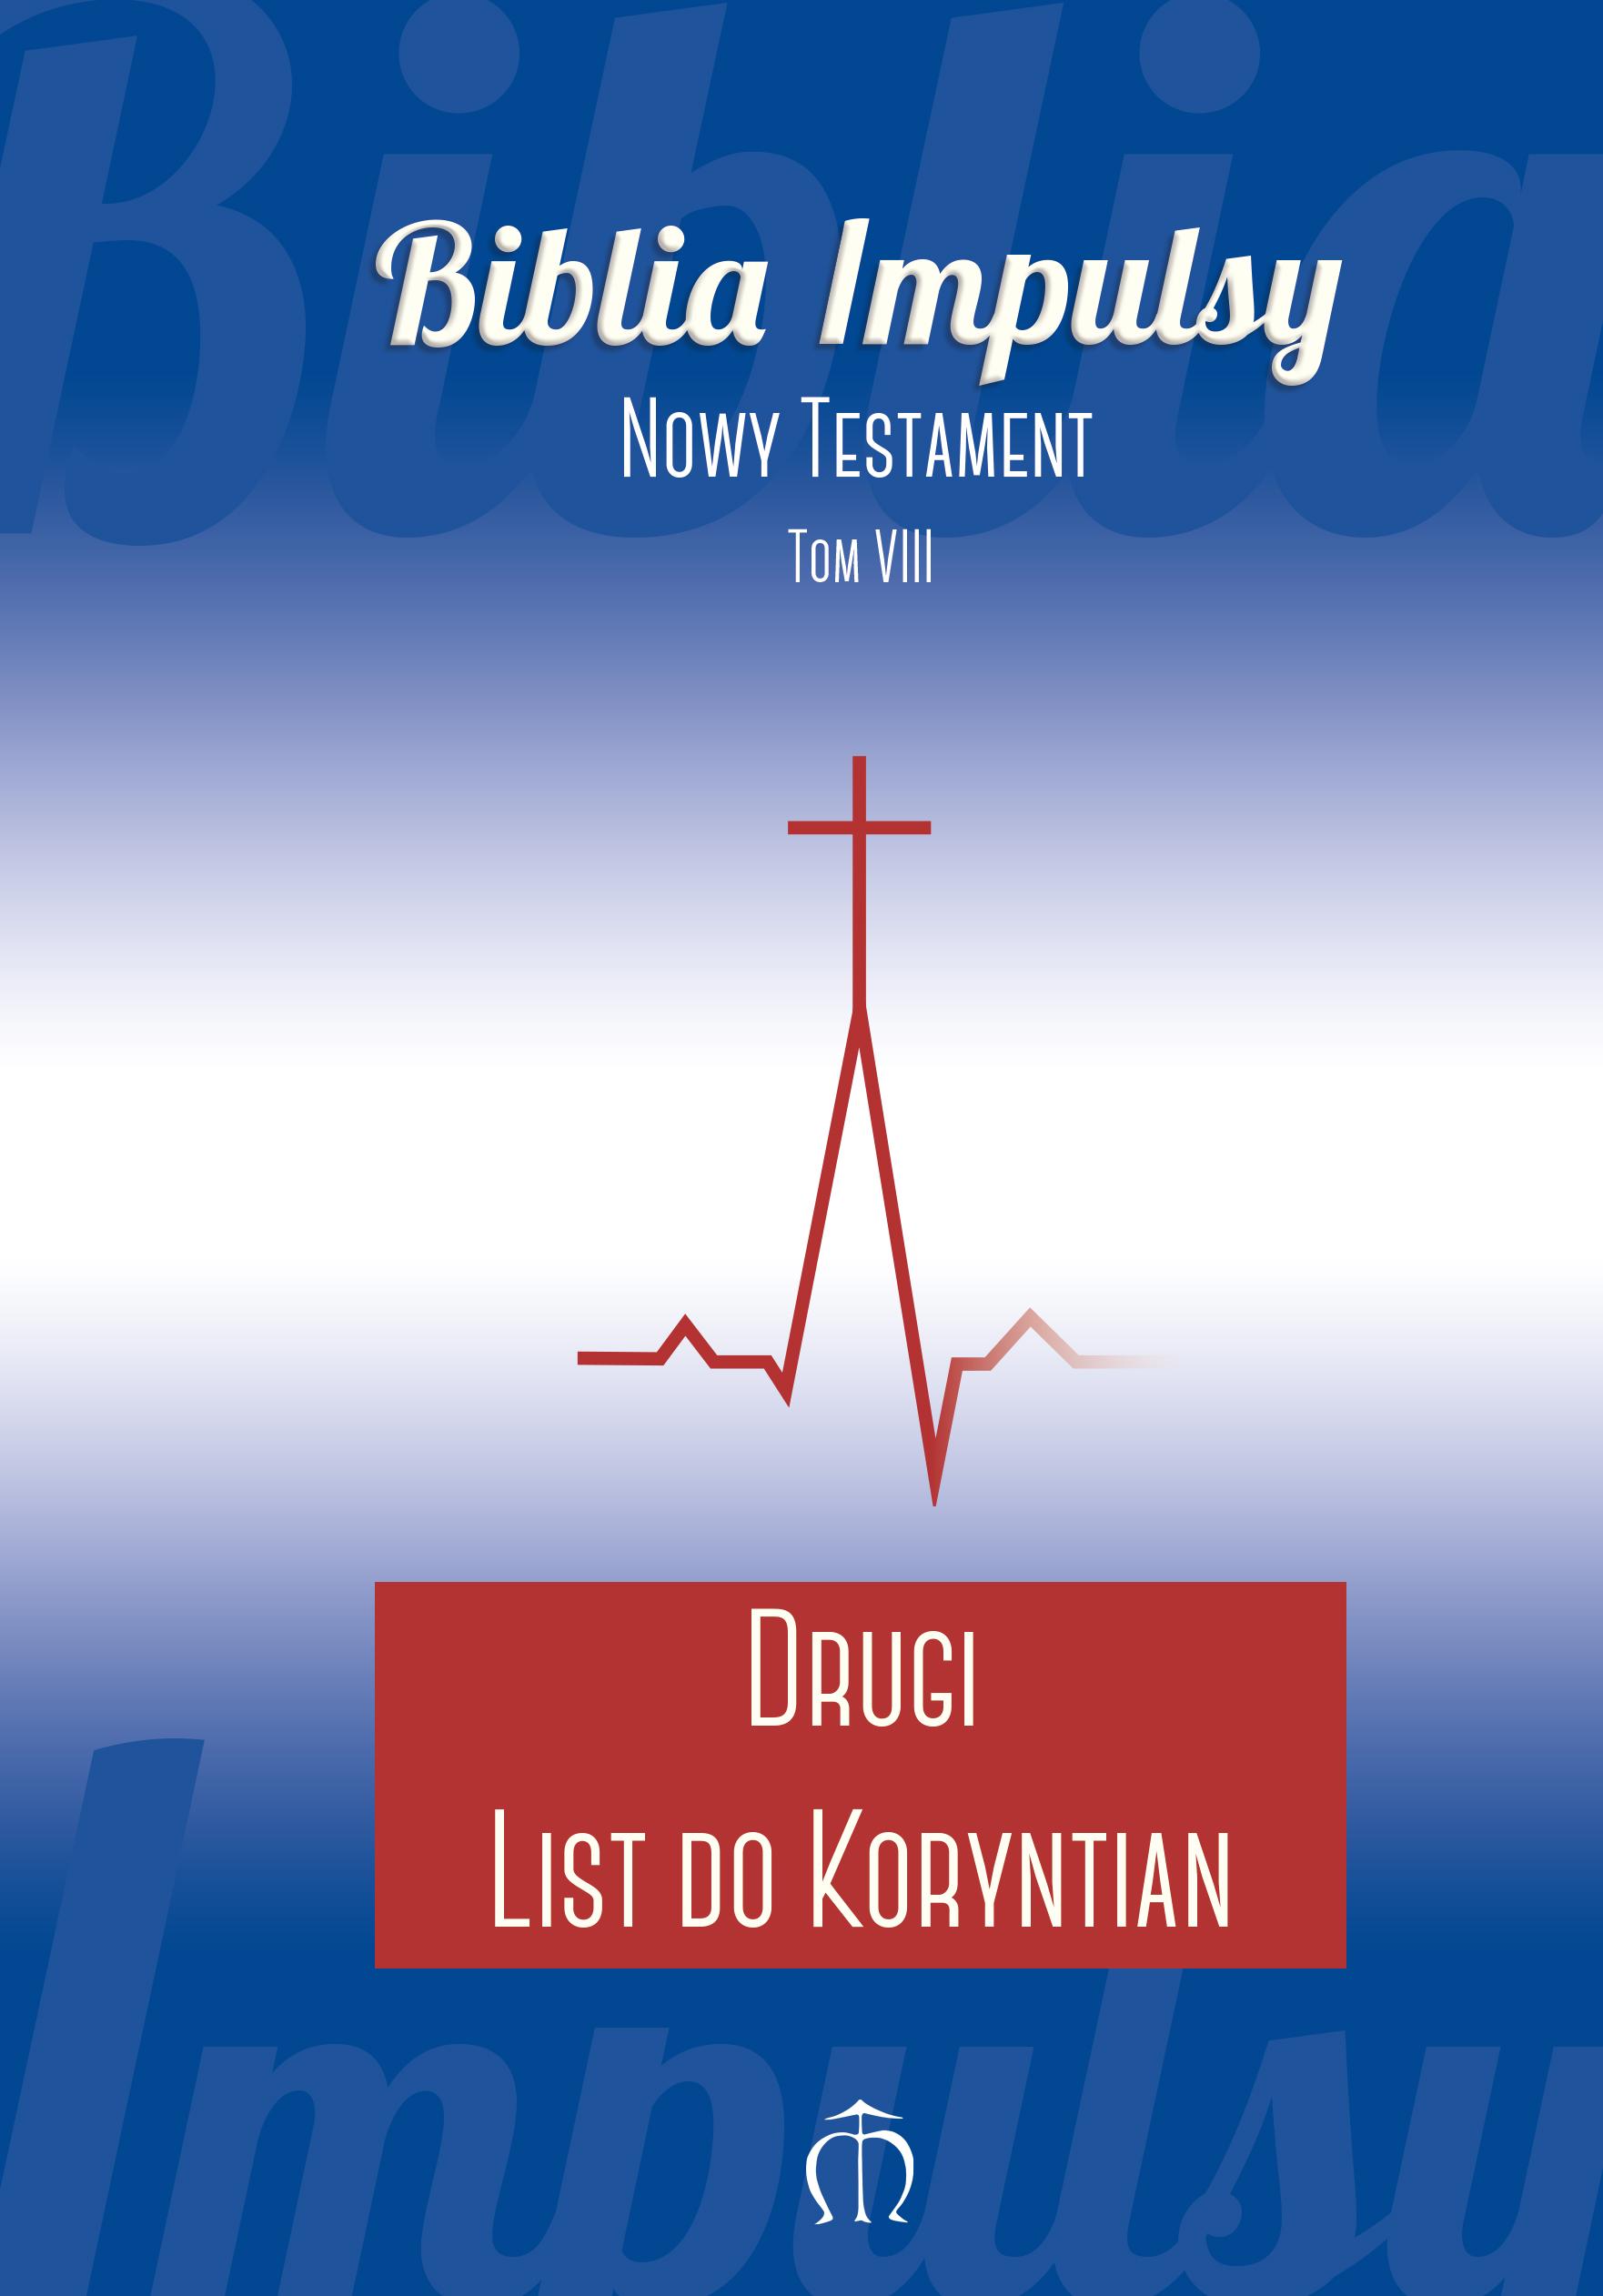 Drugi List do Koryntian